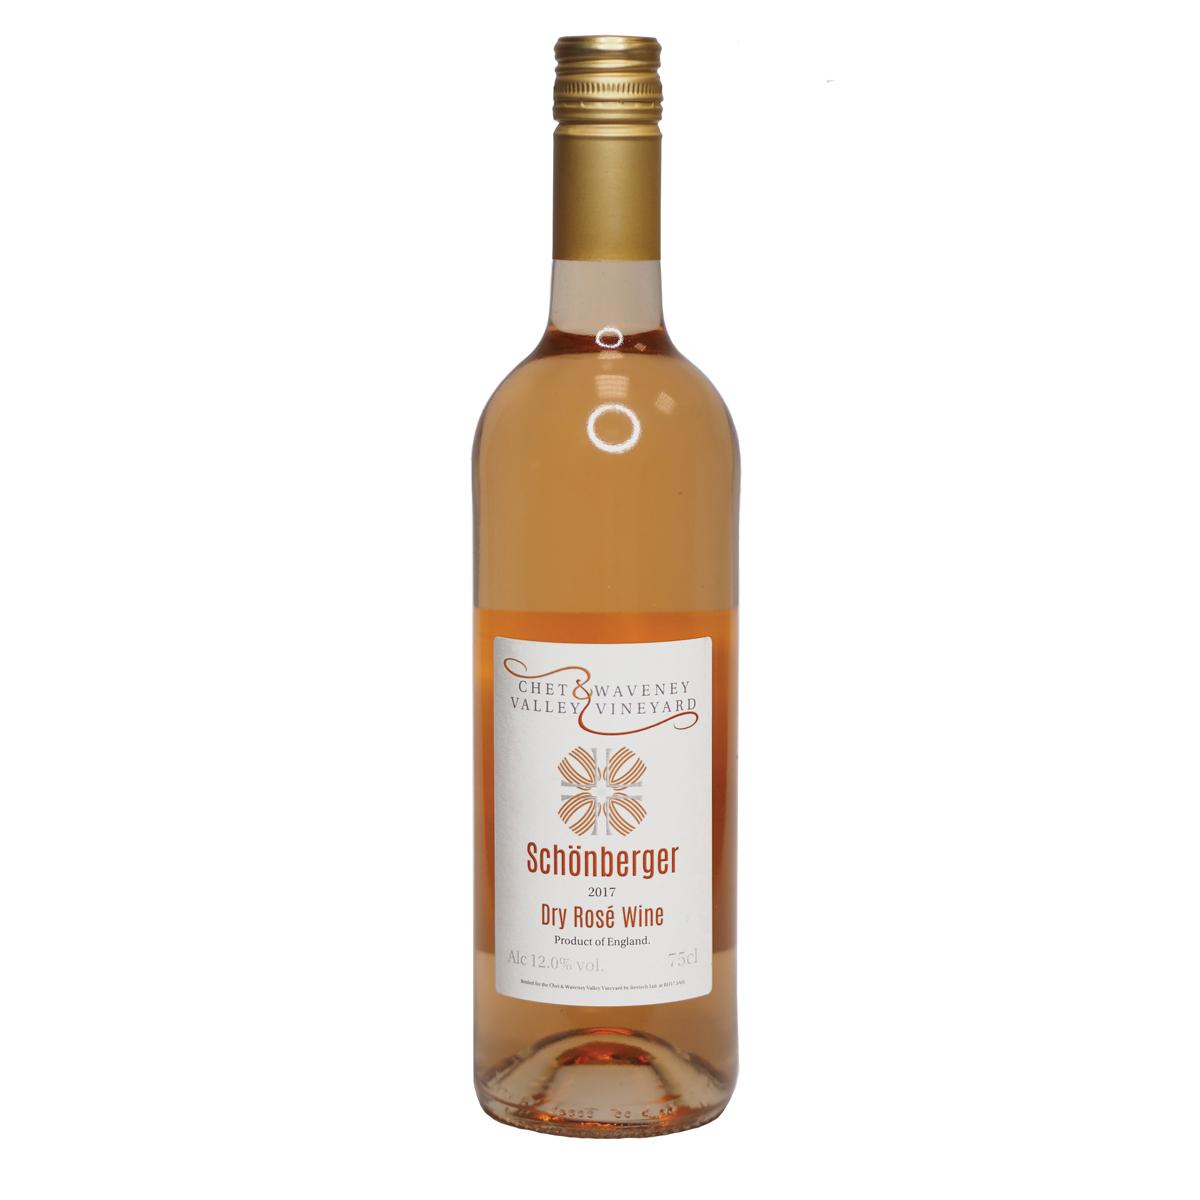 An image of Chet & Waveney Valley Vineyard Schönberger Dry Rosé